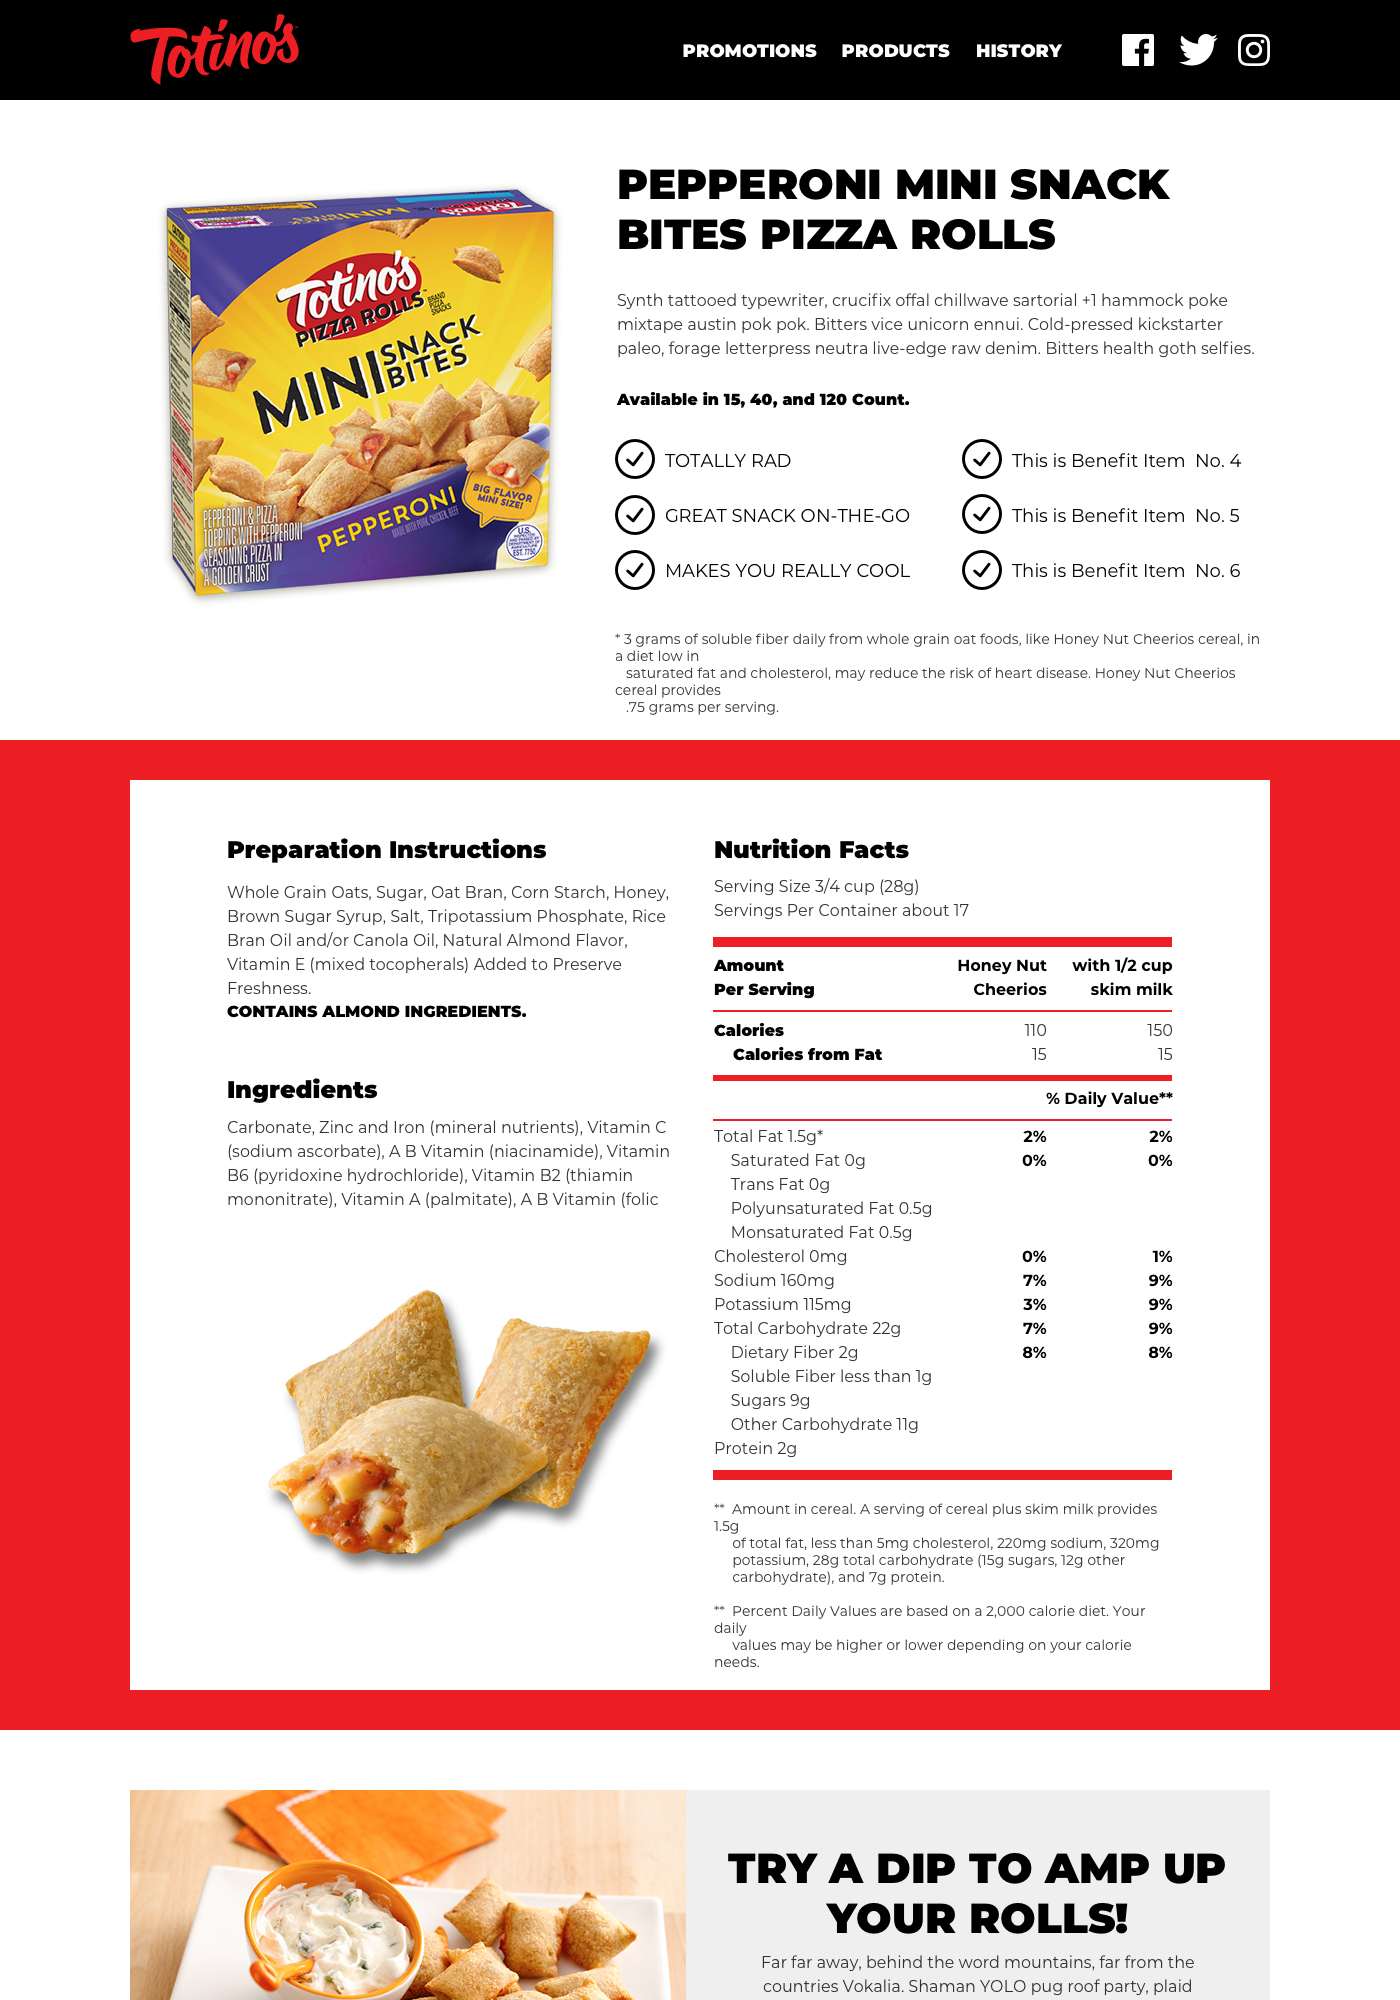 Totinos-WebsiteMockups-ProductDetail.jpg